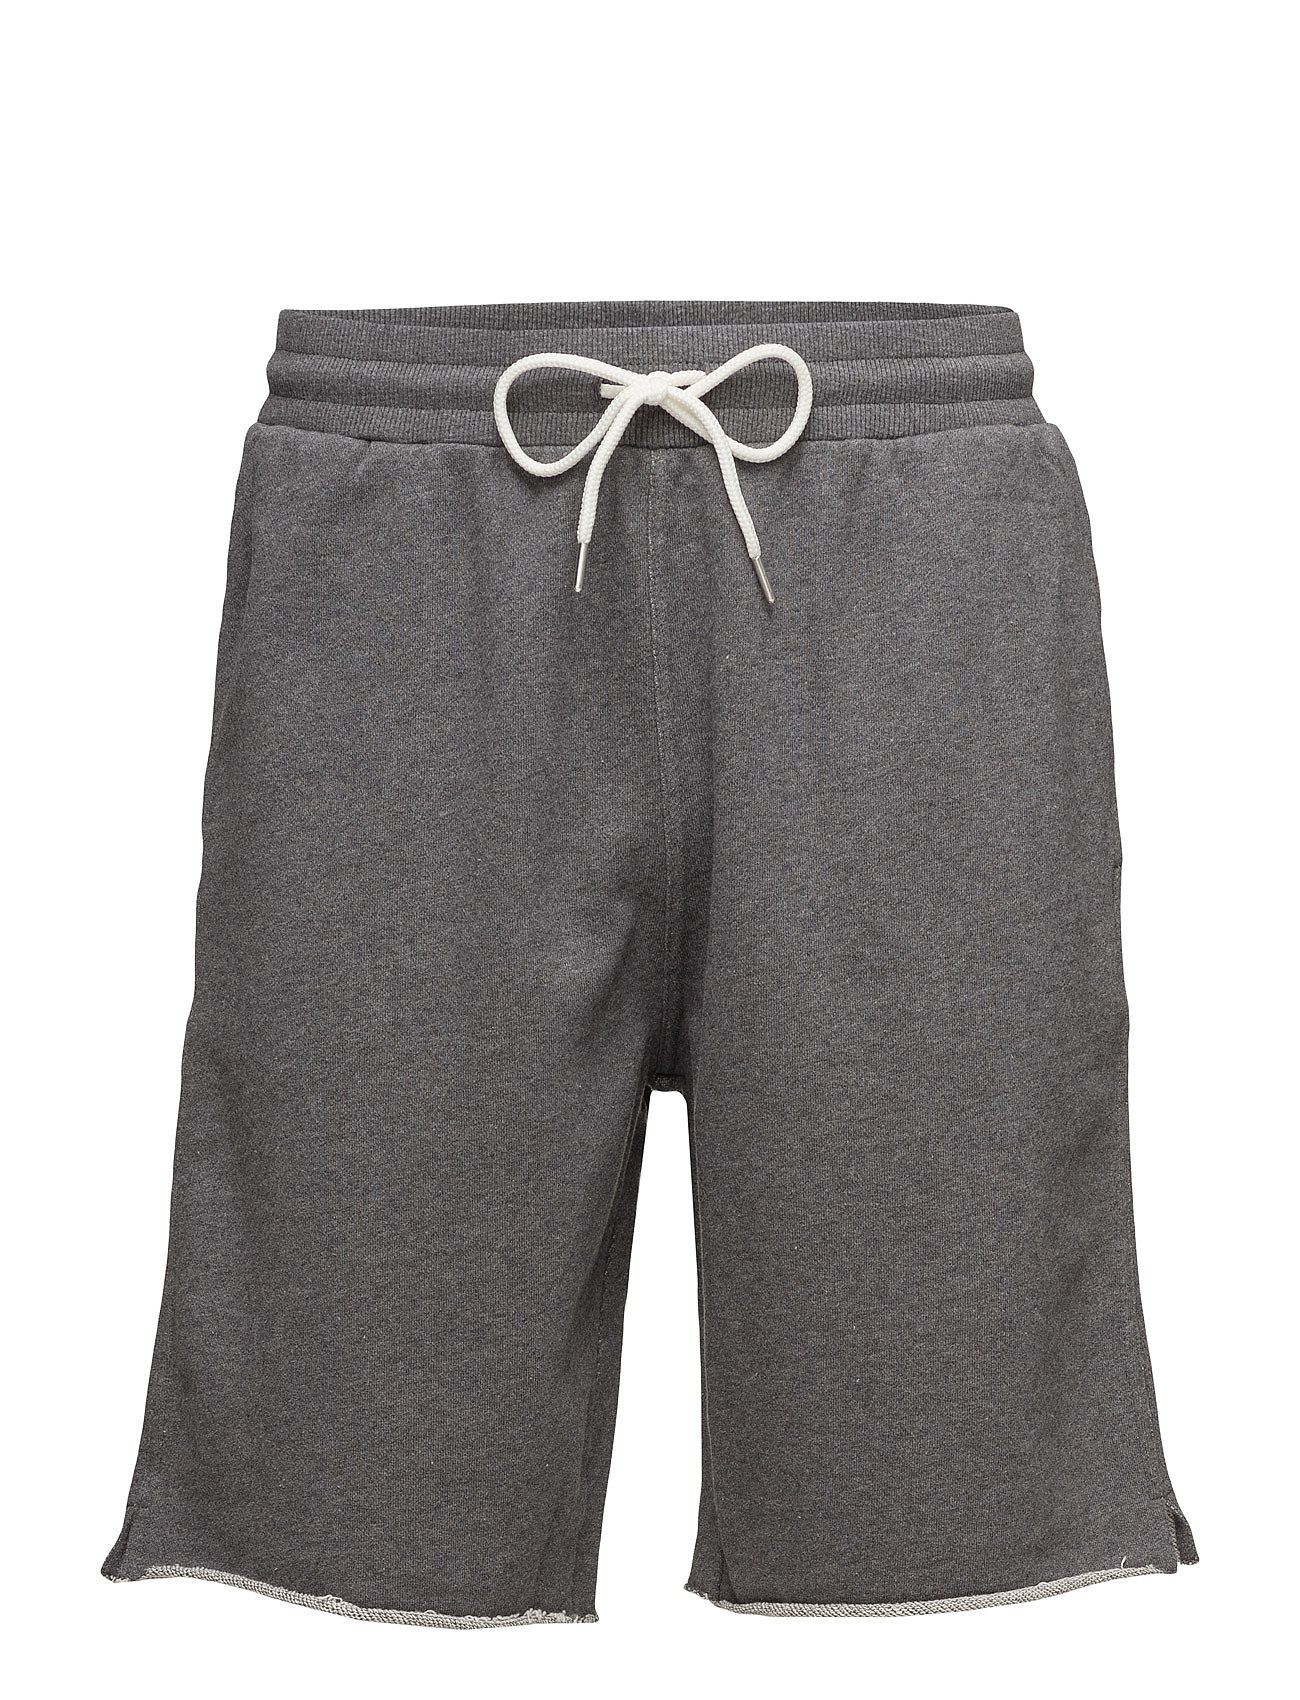 Sweat chino shorts fra han kjã¸benhavn fra boozt.com dk